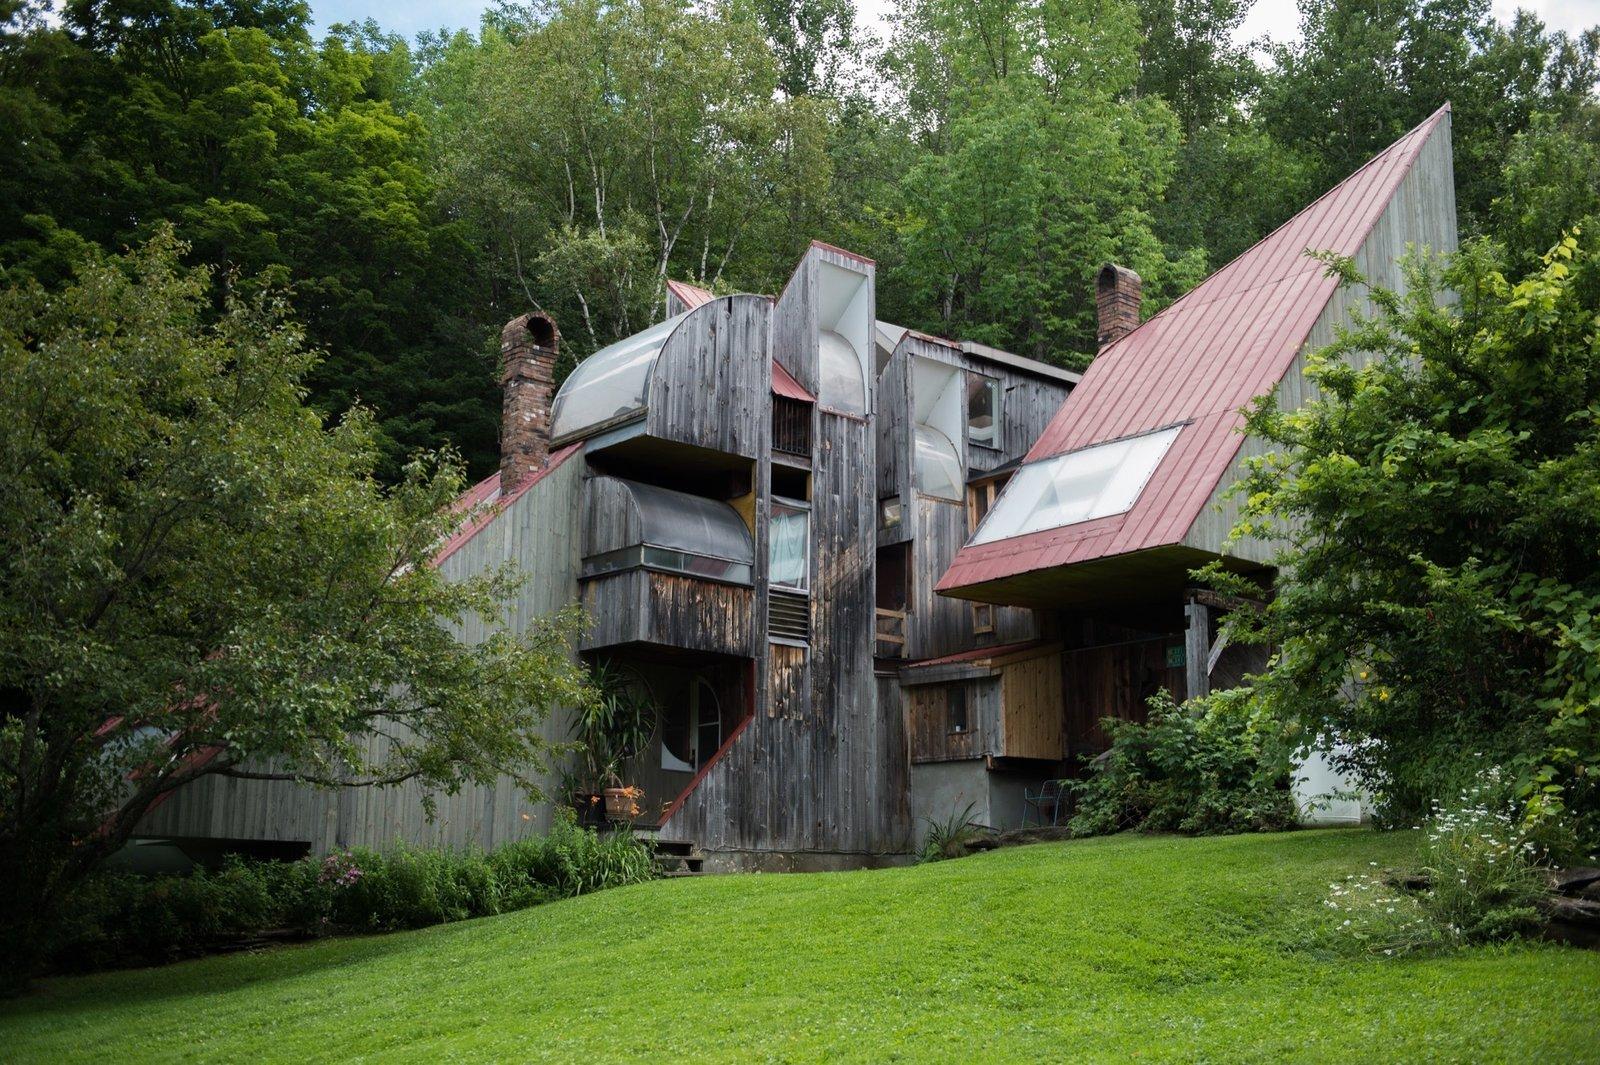 Photo 6 of 11 in Architecture Improv